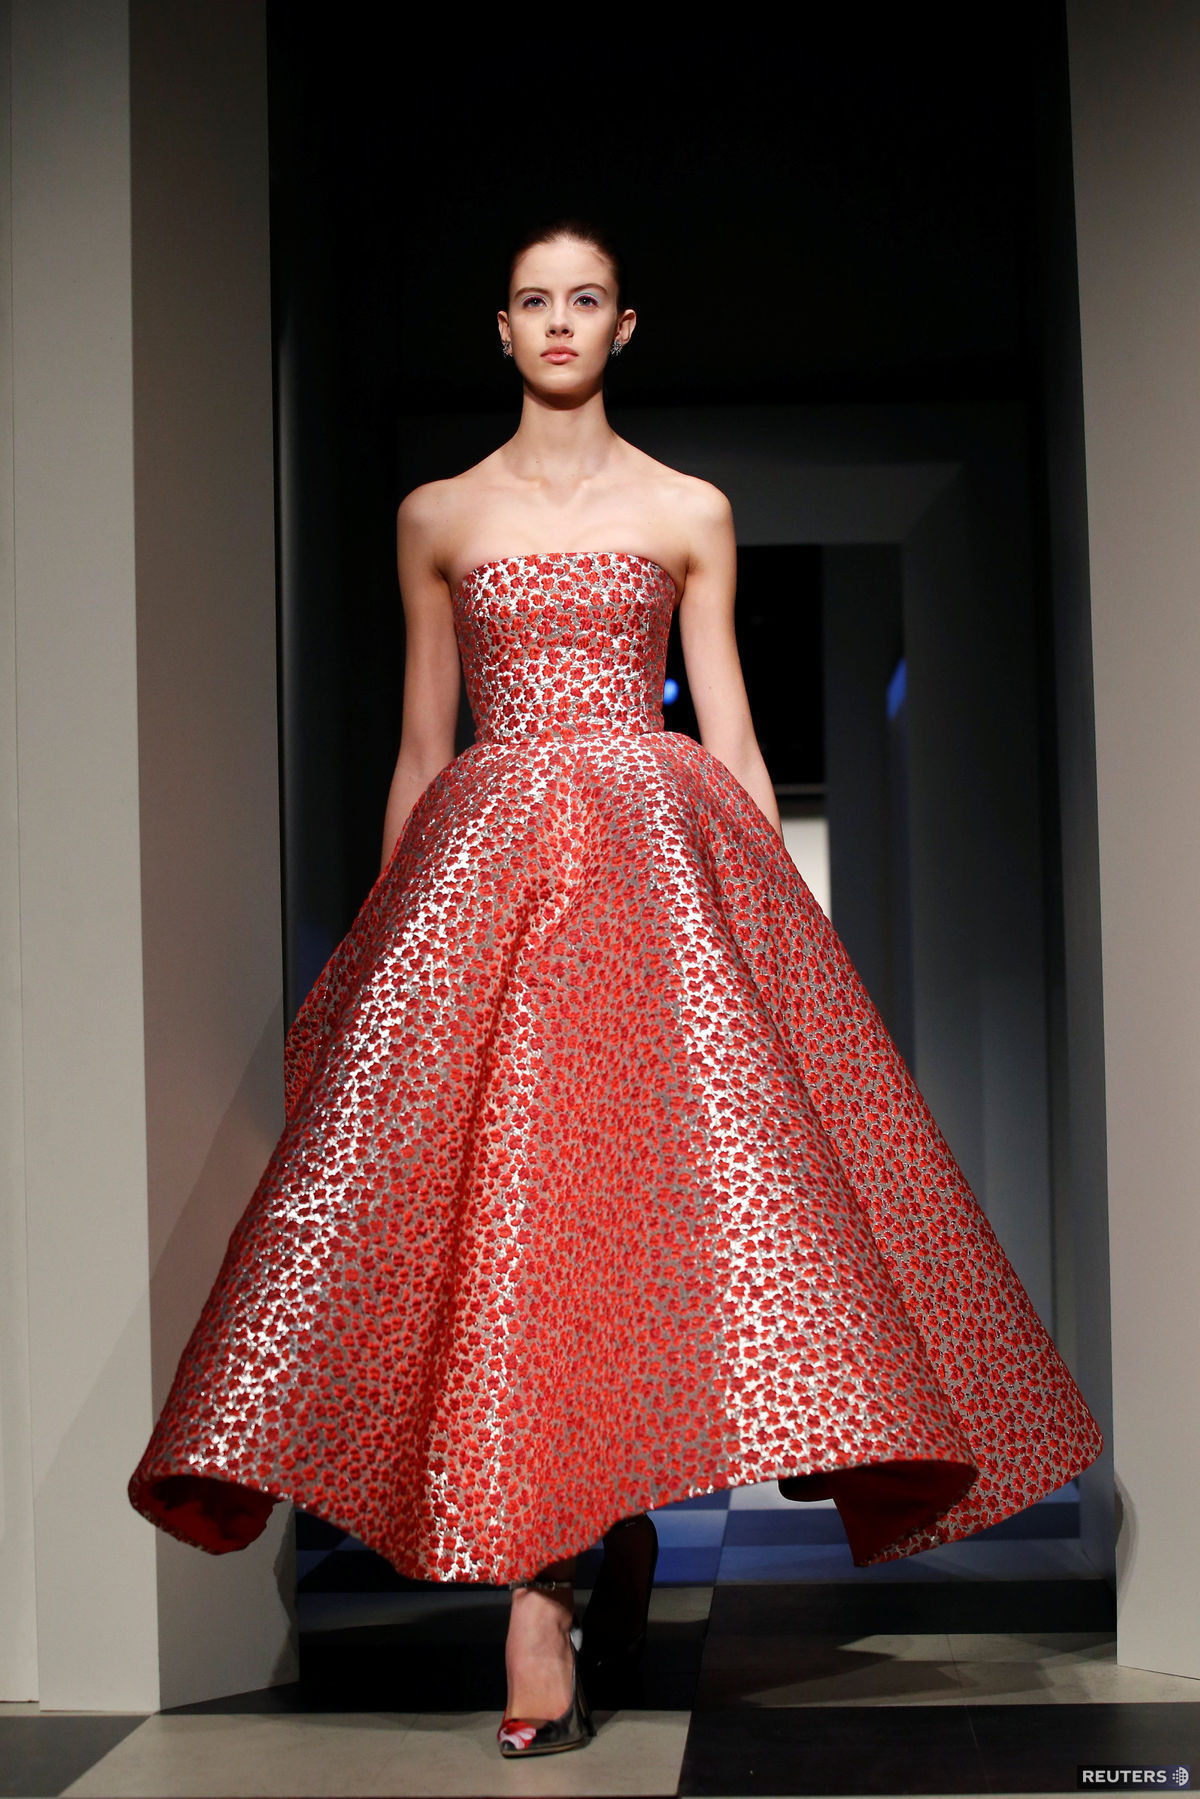 Česká modelka Barbora Podzimková na prehliadke Oscar de la Renta v New Yorku.